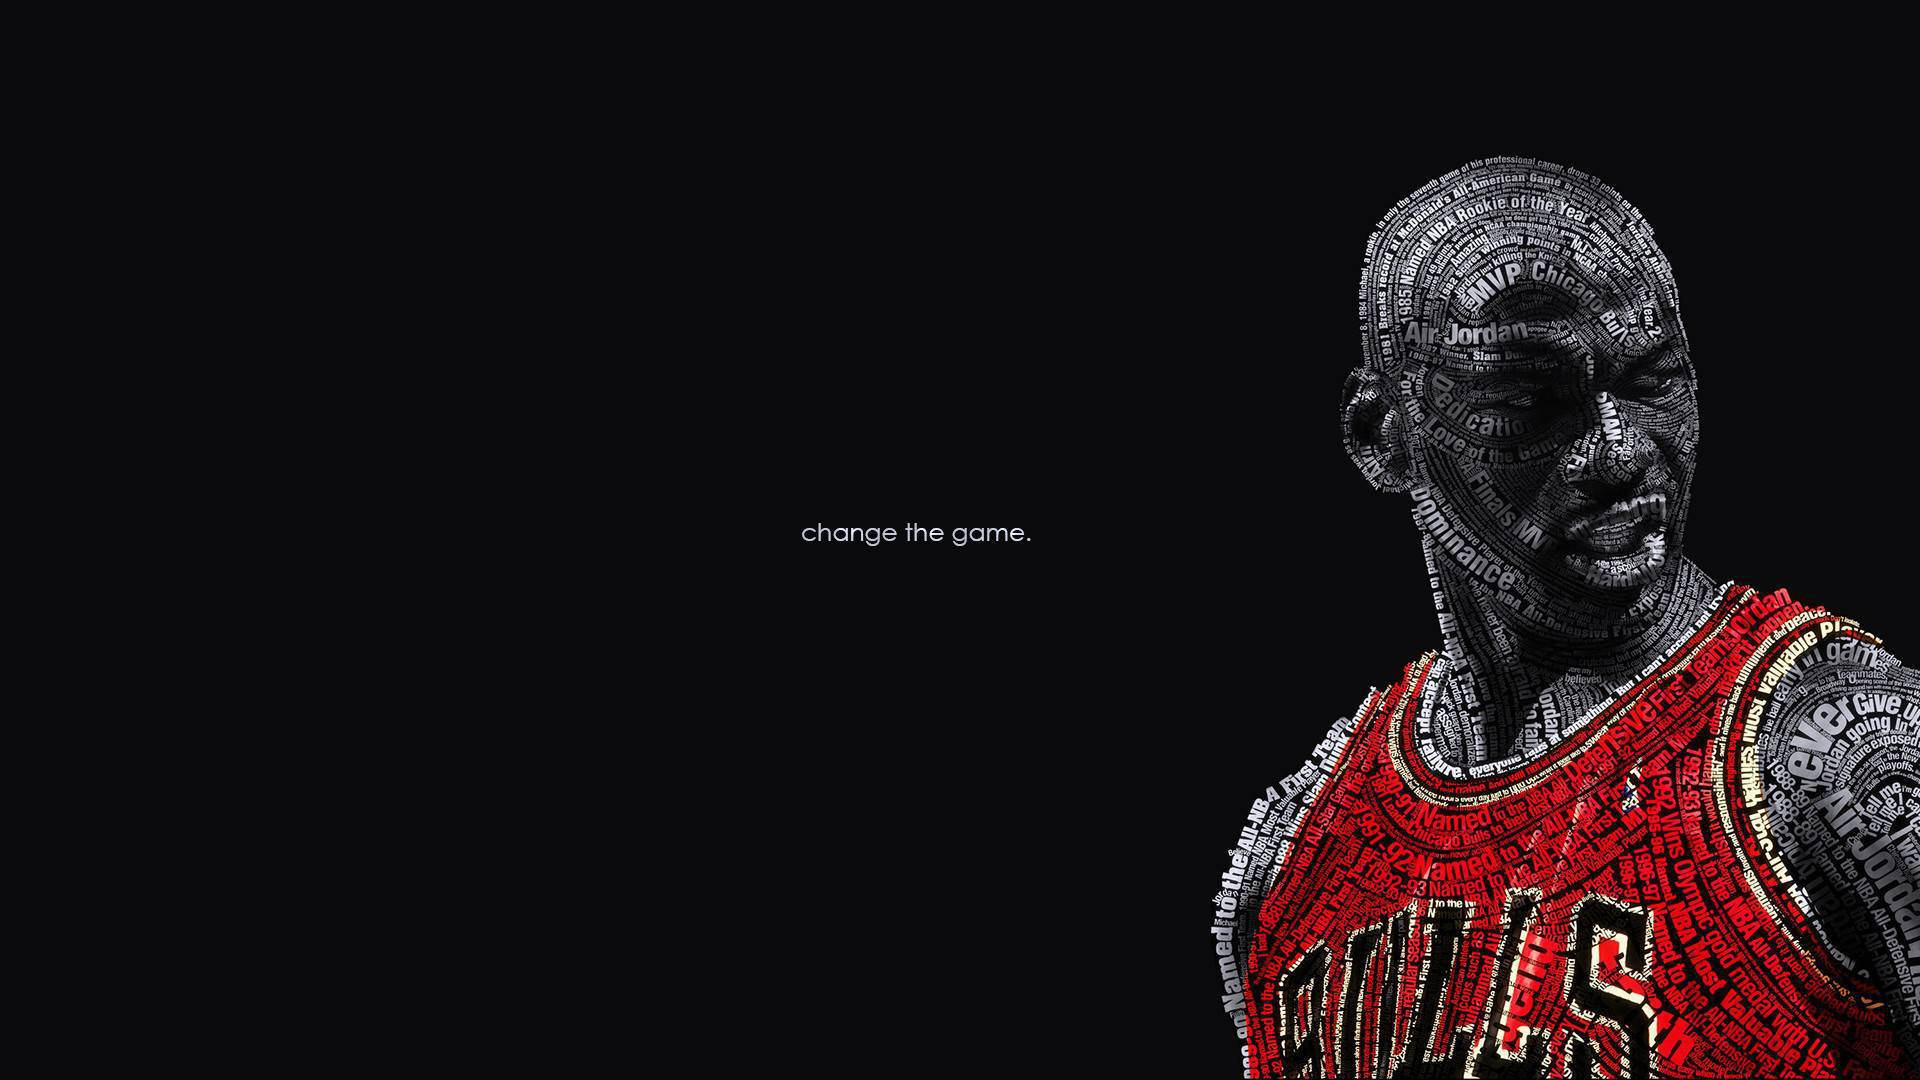 Fondos de Pantalla Wallpapers Gratis Jordan   NBA Wallpaper 1920x1080 1920x1080